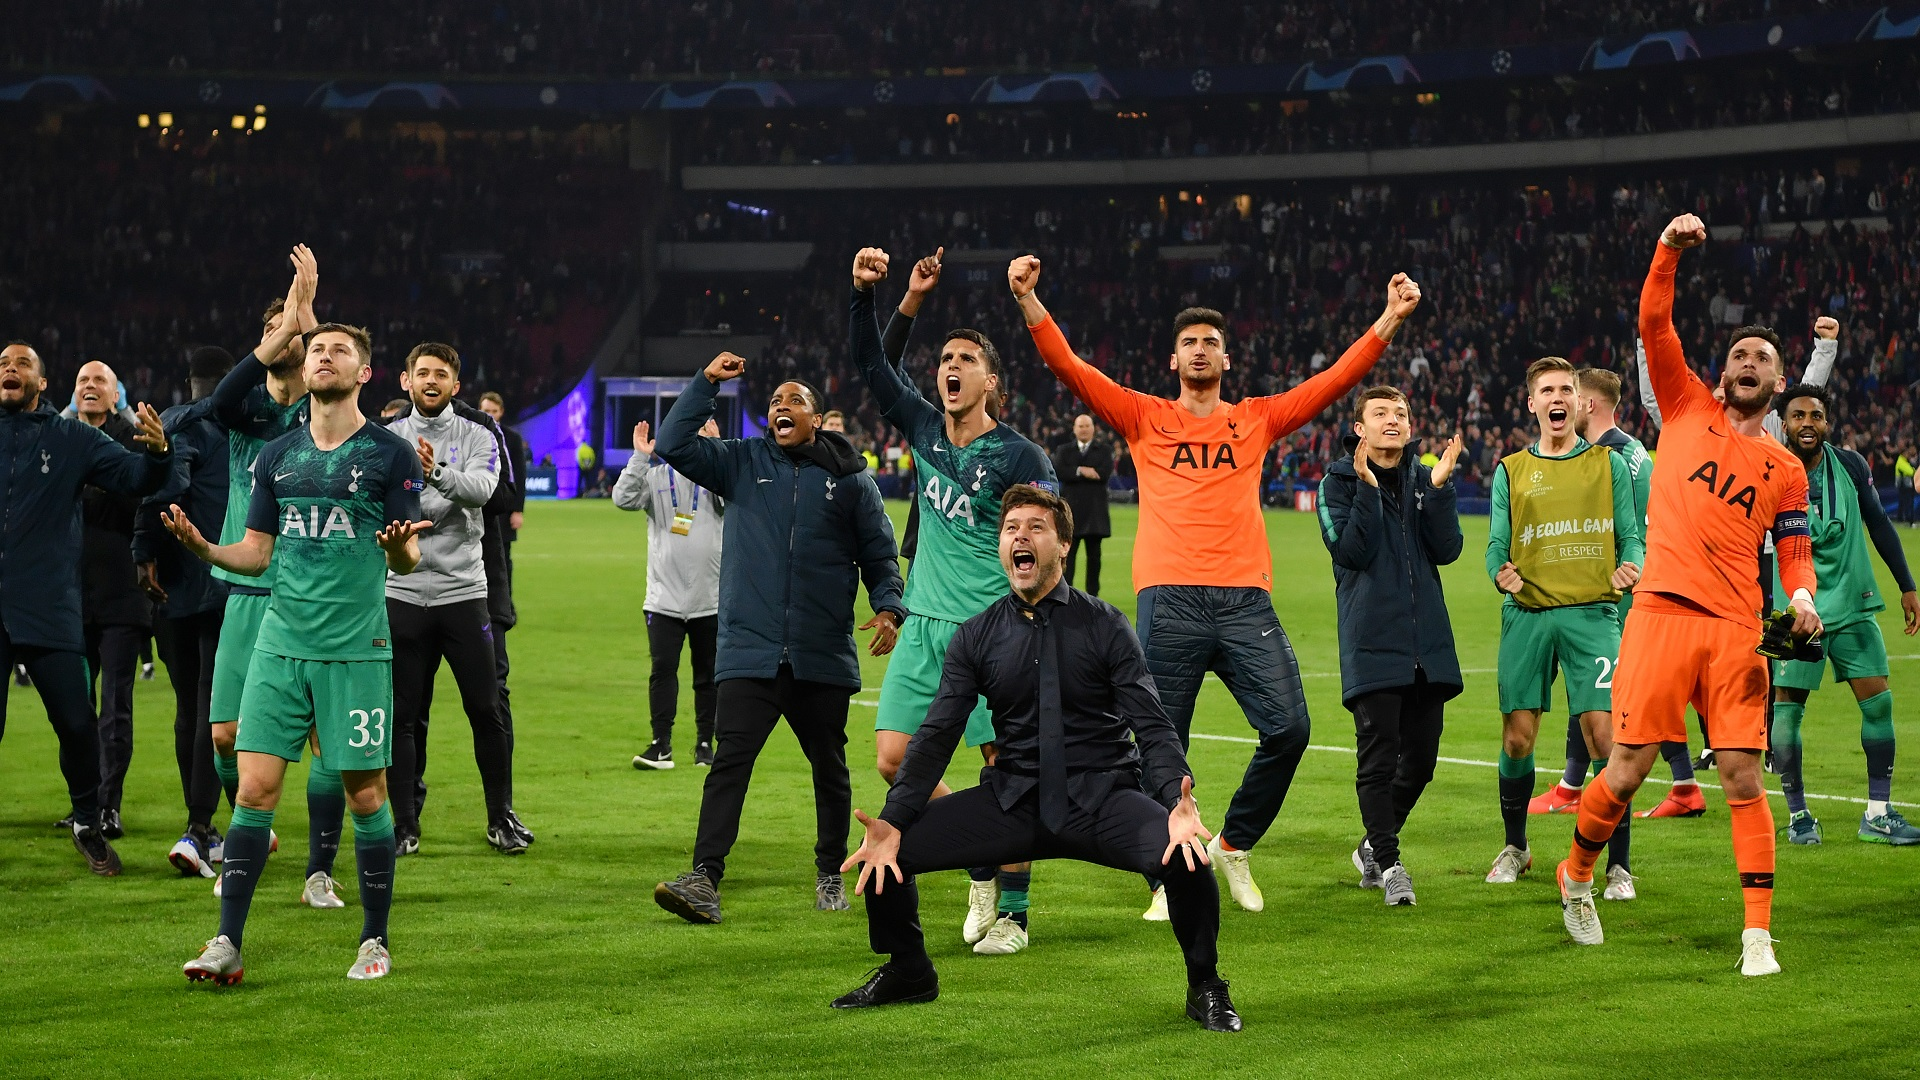 'Offensively, Ajax were 10 times better than Spurs' - De Jong welcomes away goal rule abolishment